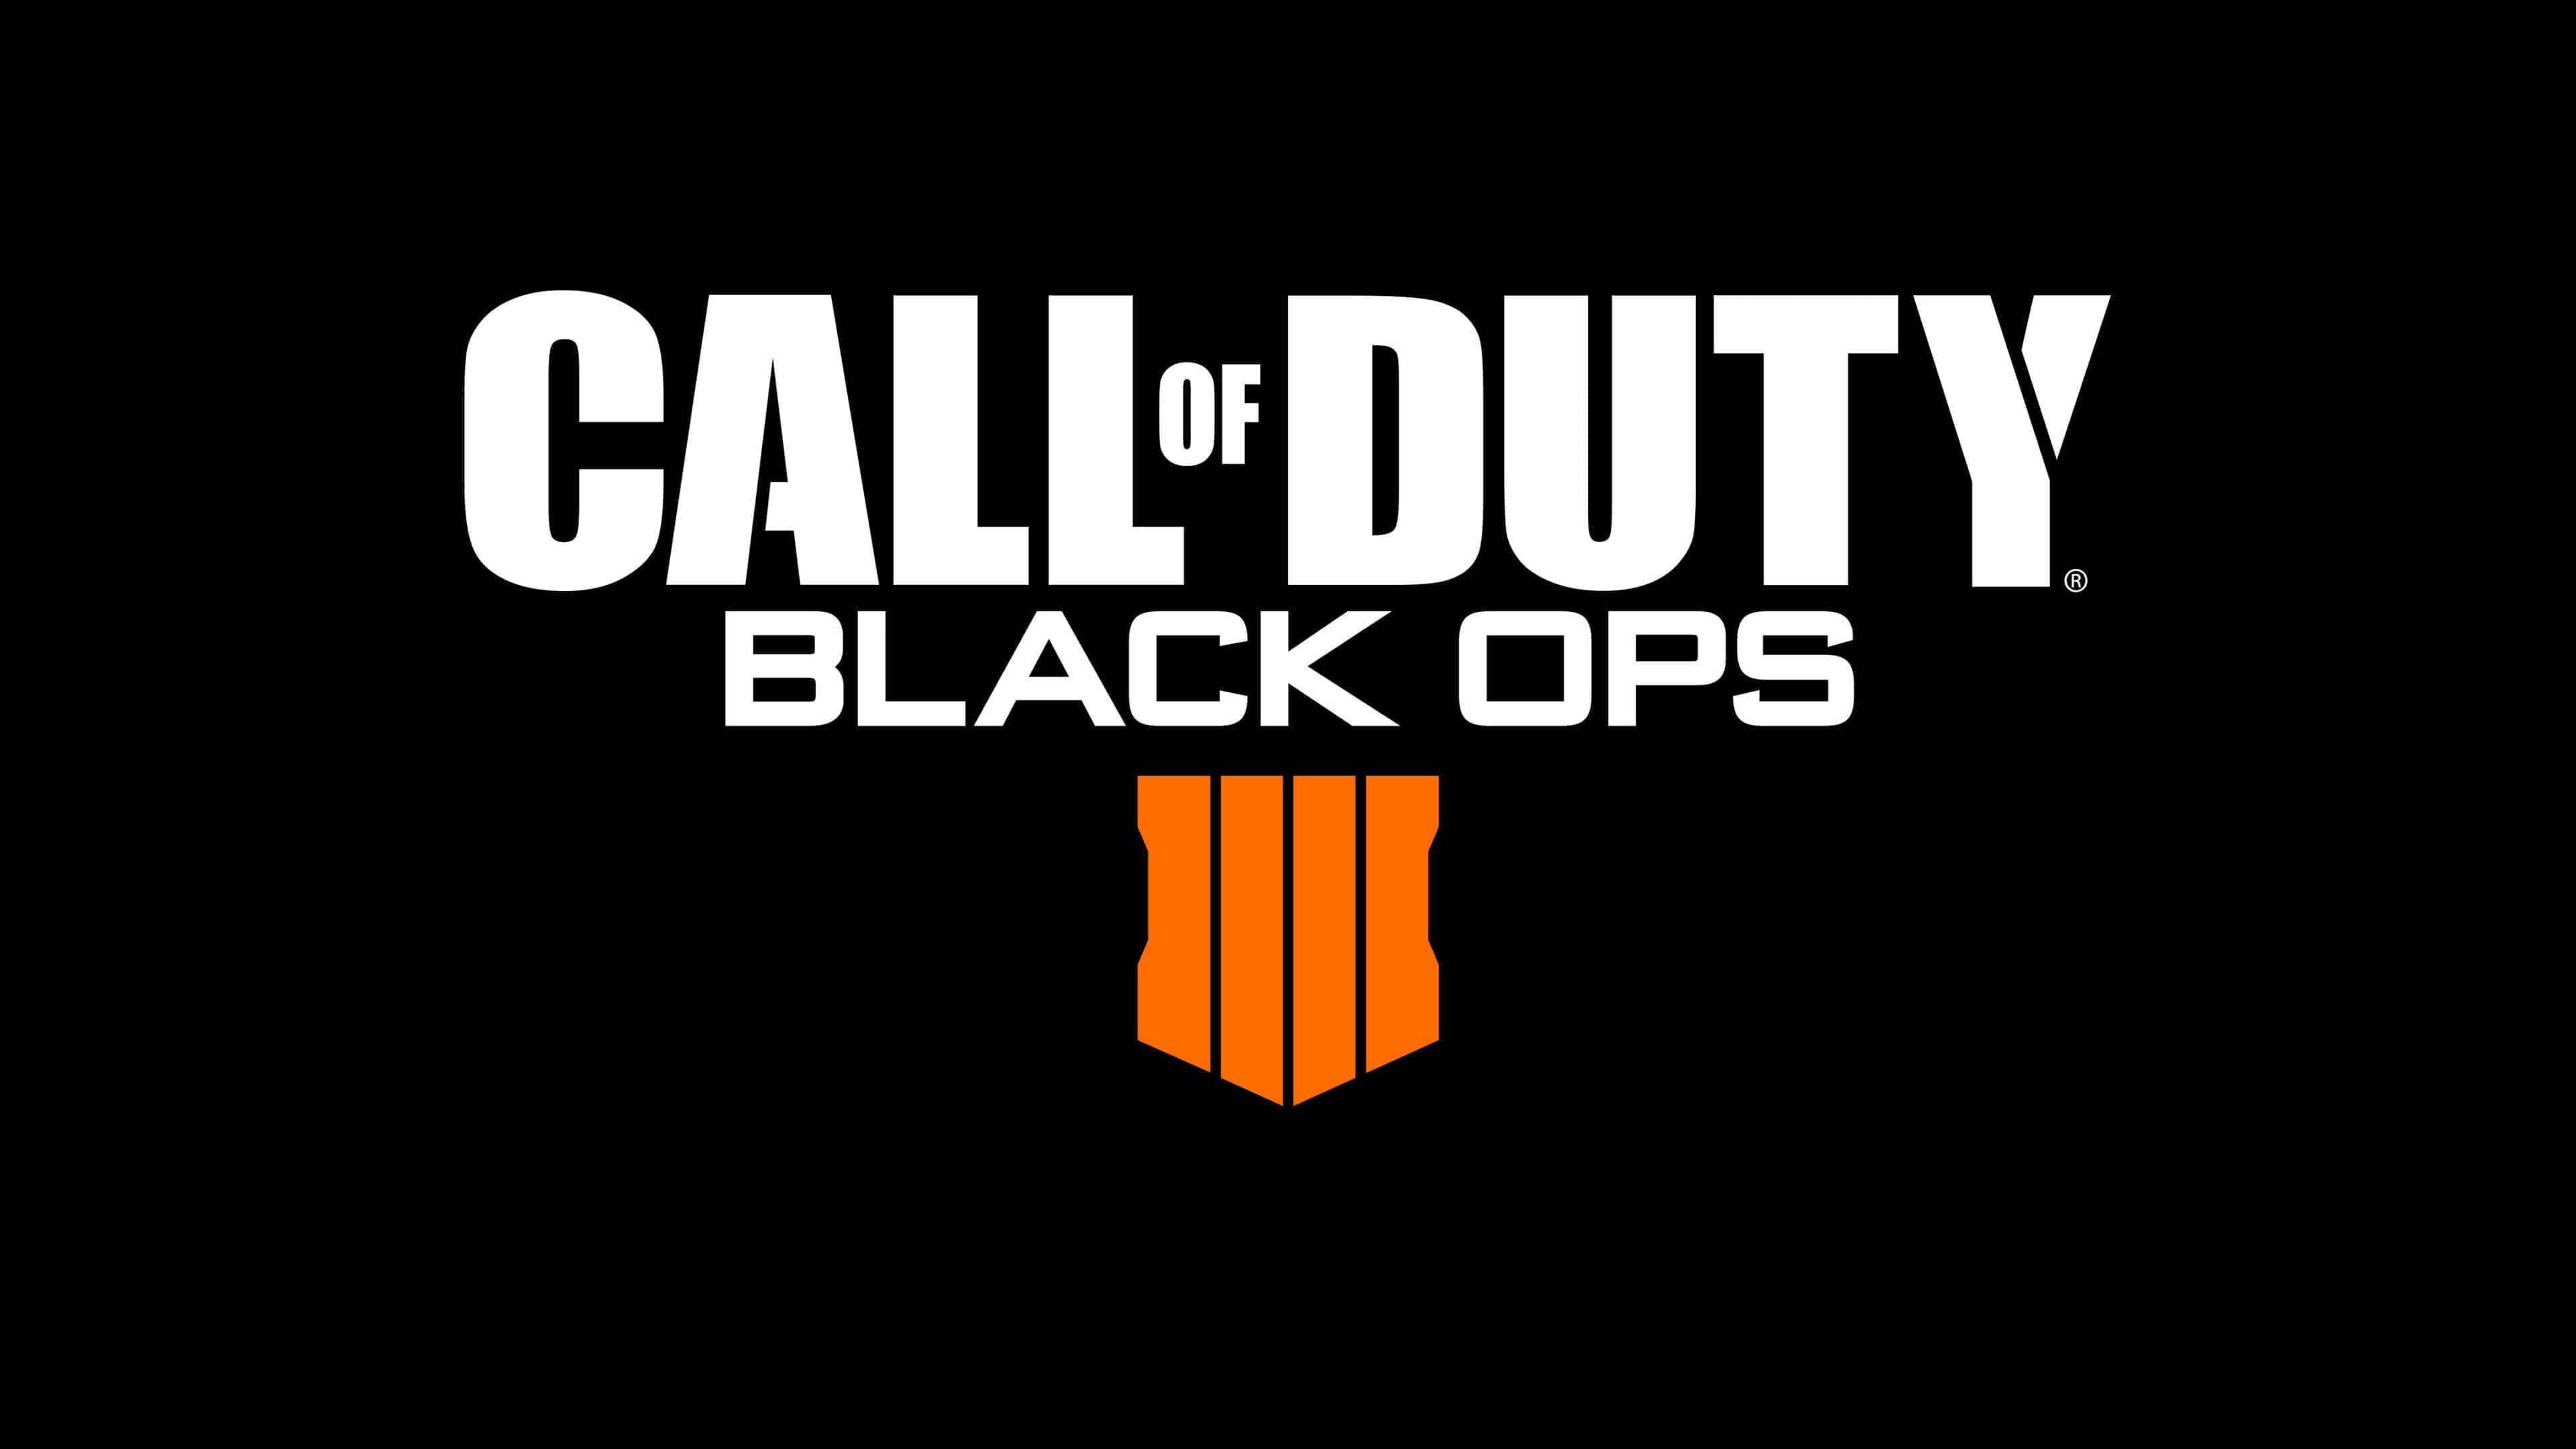 black ops 4 logo background wallpaper 65187